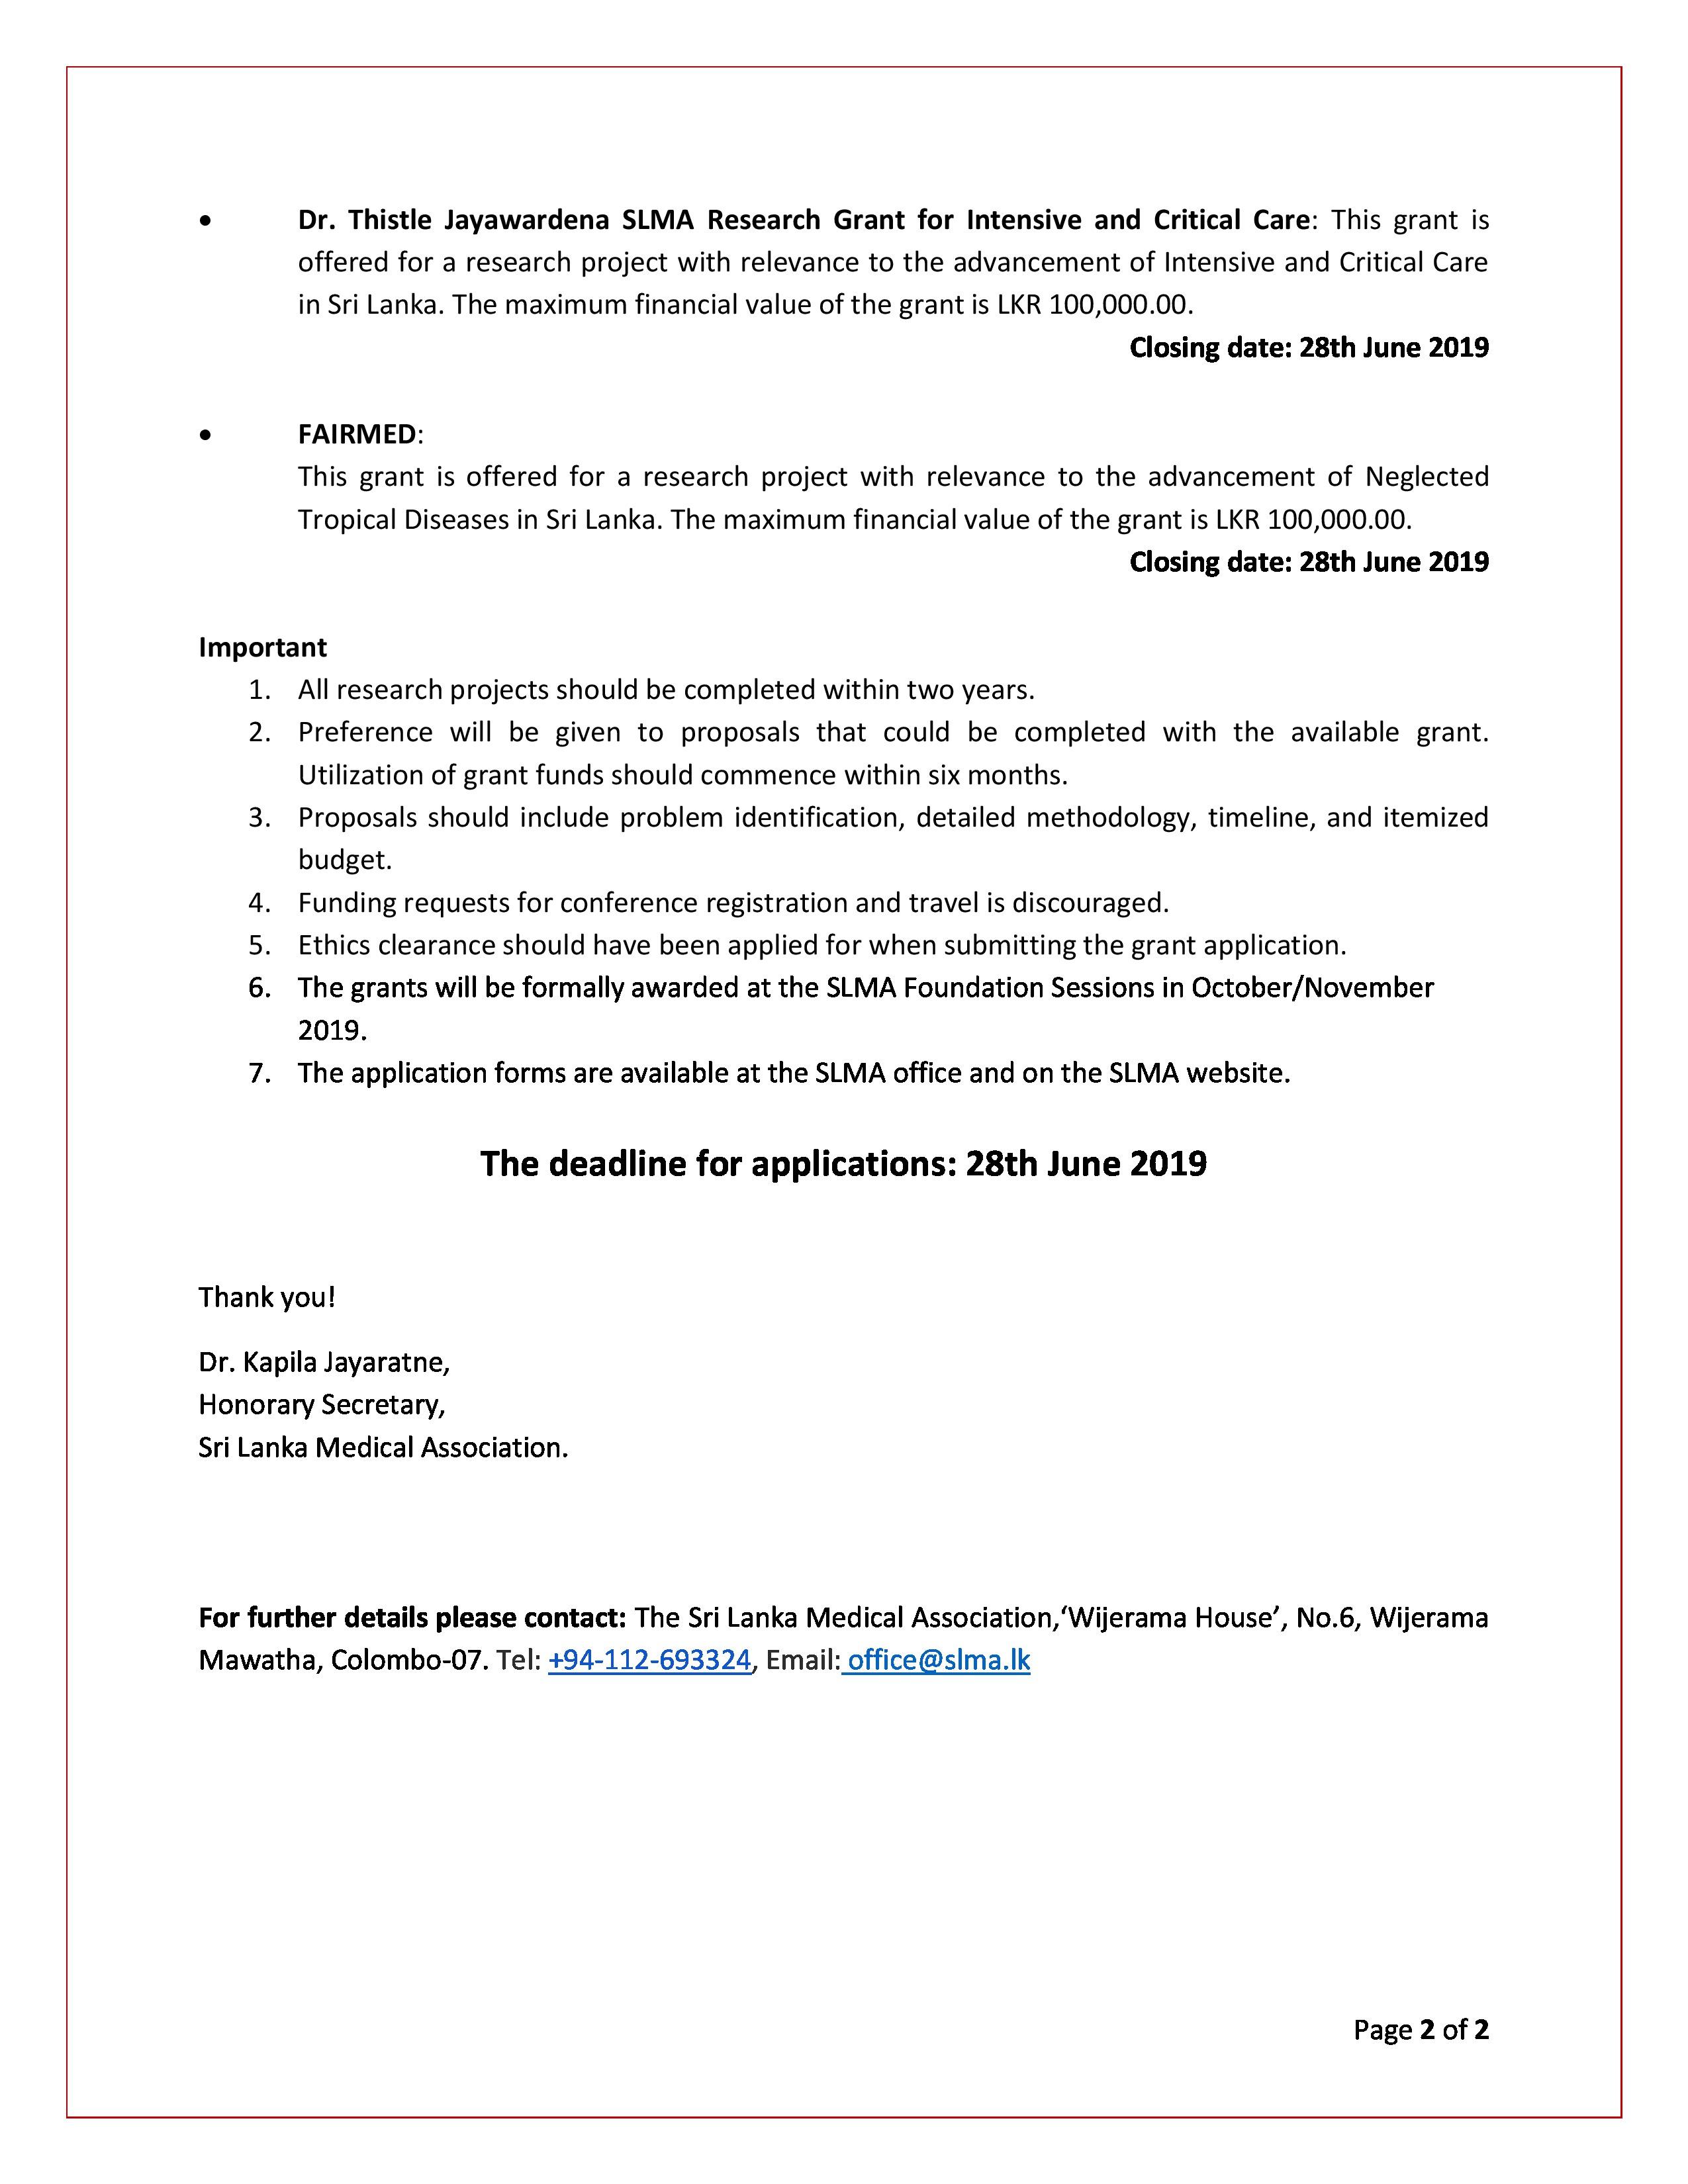 Research Awards and Grants | The Sri Lanka Medical Association (SLMA)